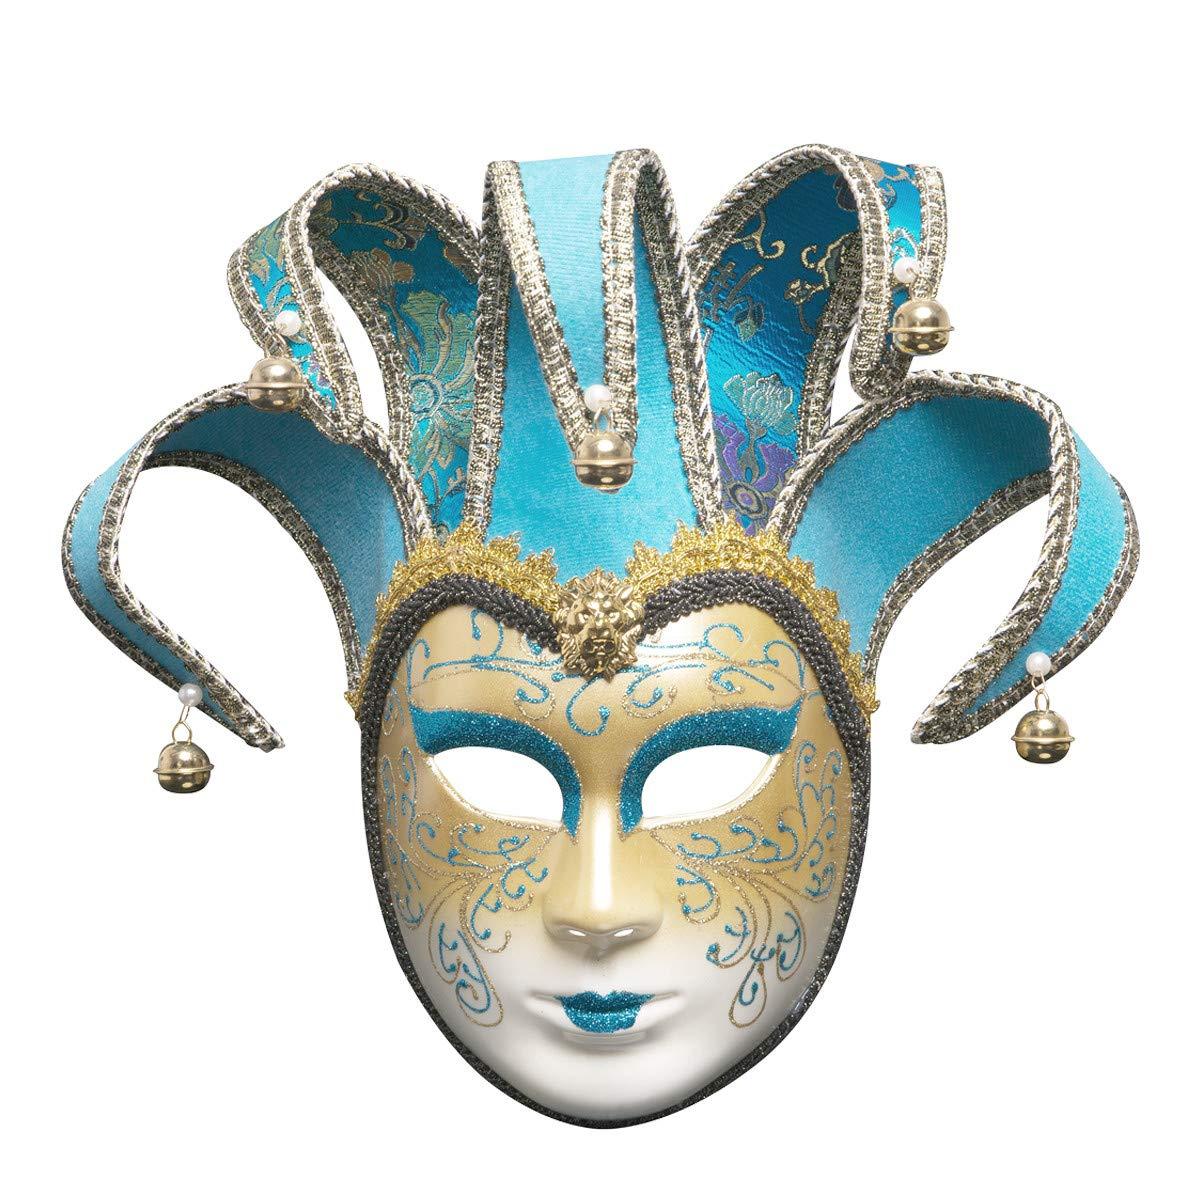 Sonmer Full Face Venetian Joker Masquerade Theater Mask, Mardi Gras Party Ball Mask (Light Blue)